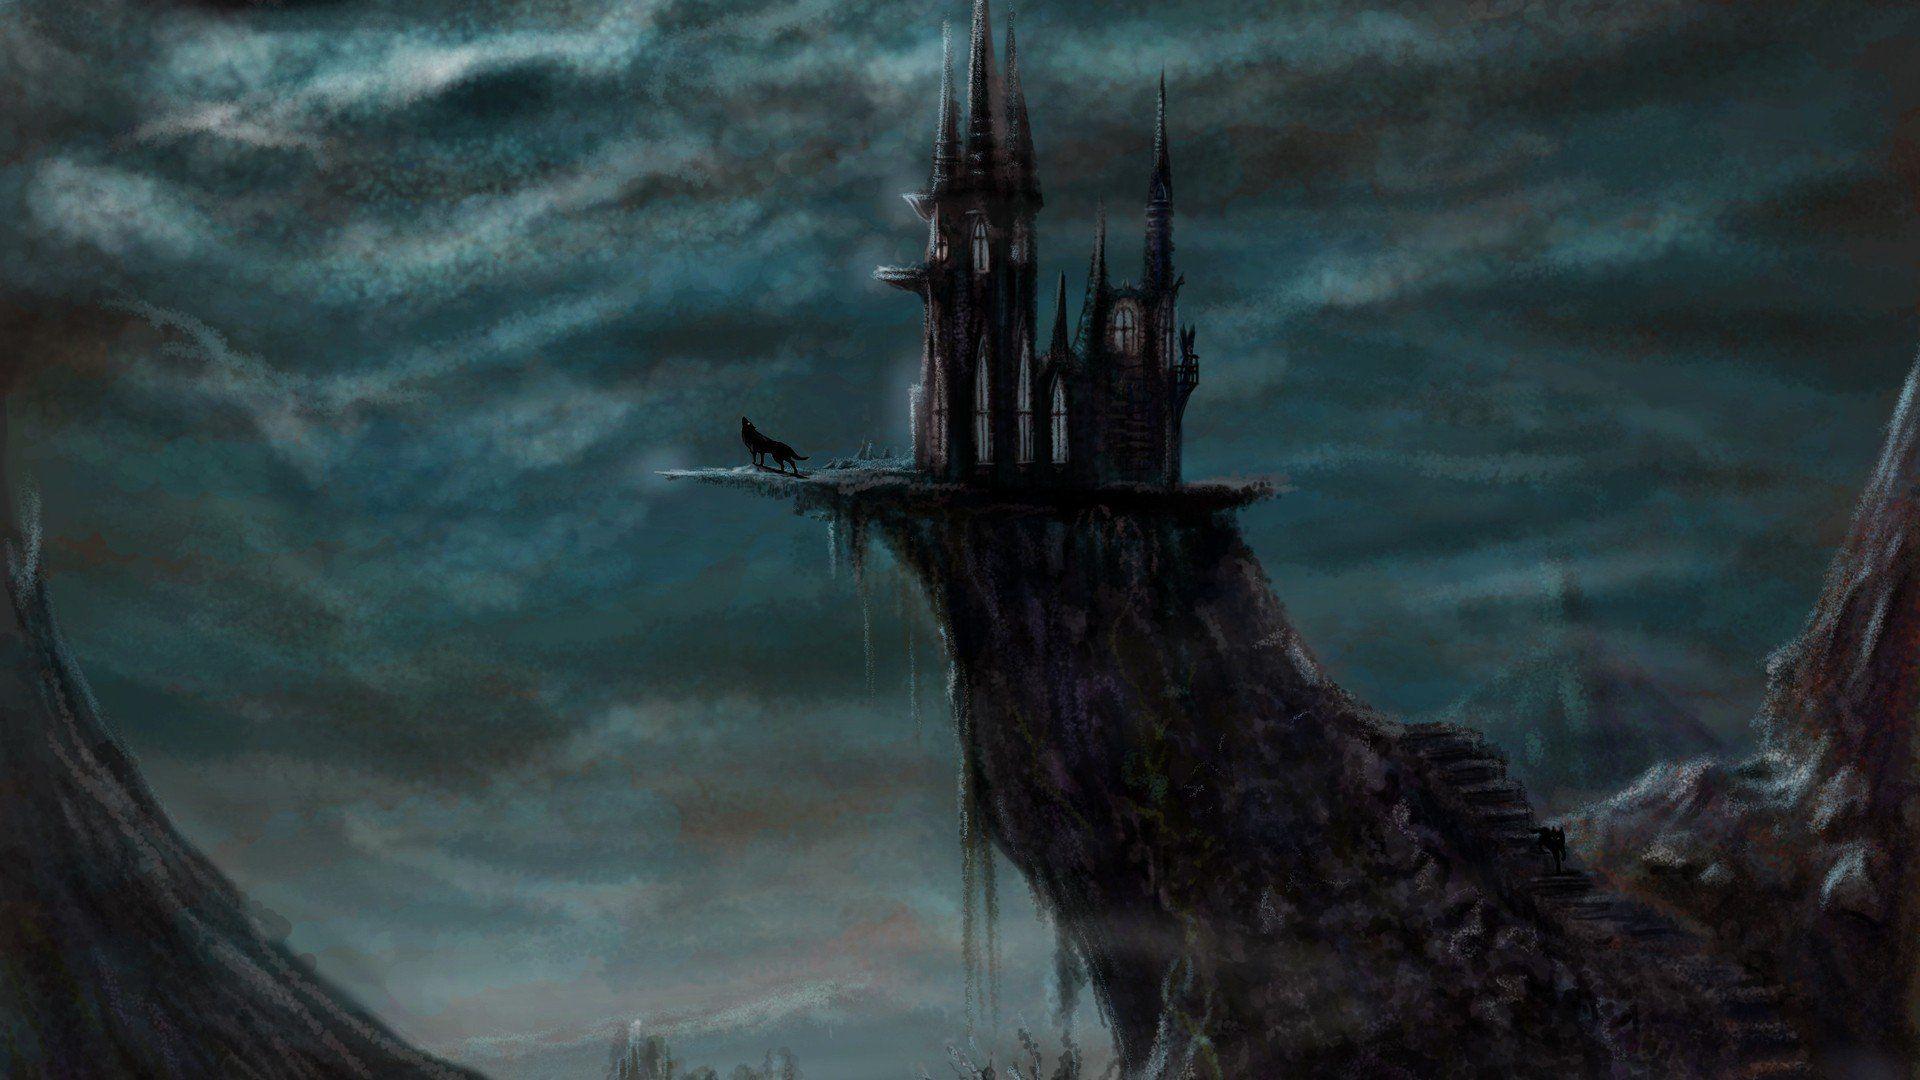 Undefined Dark Castle Backgrounds 35 Wallpapers Adorable Wallpapers Dark Castle Fantasy Posters Castle Background